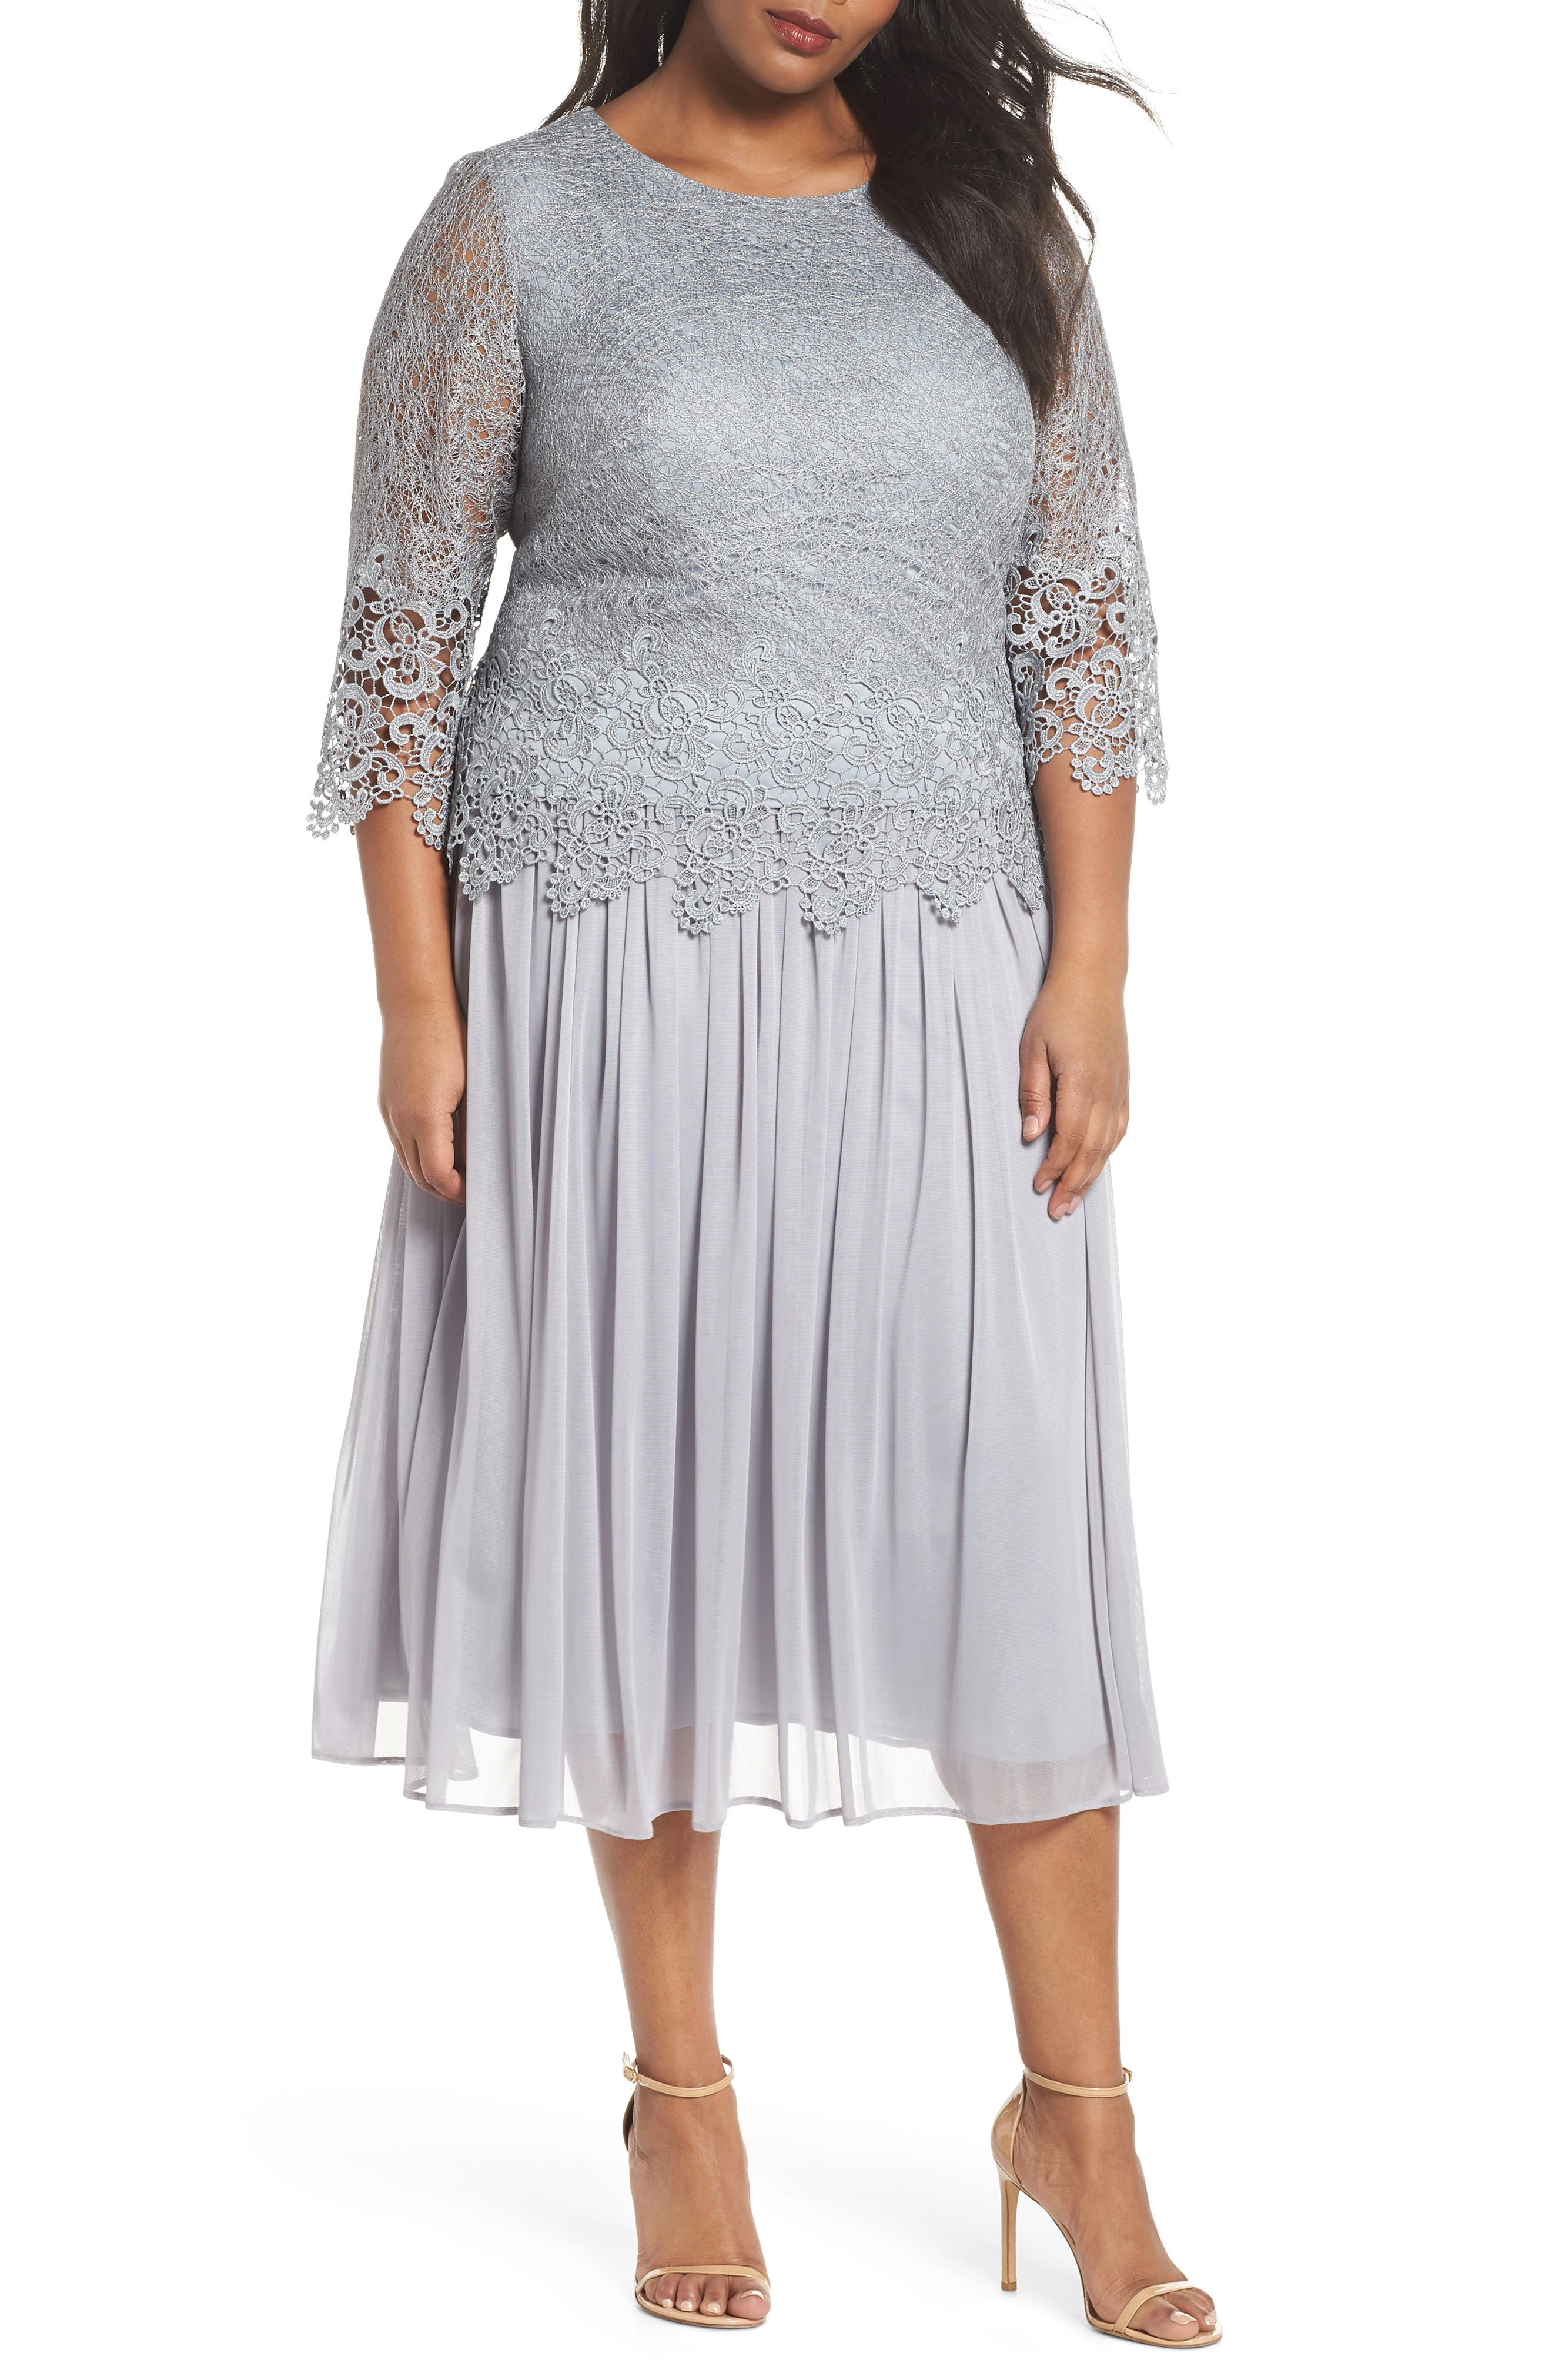 Main Image - Alex Evenings Lace & Chiffon Tea Length Dress (Plus Size)